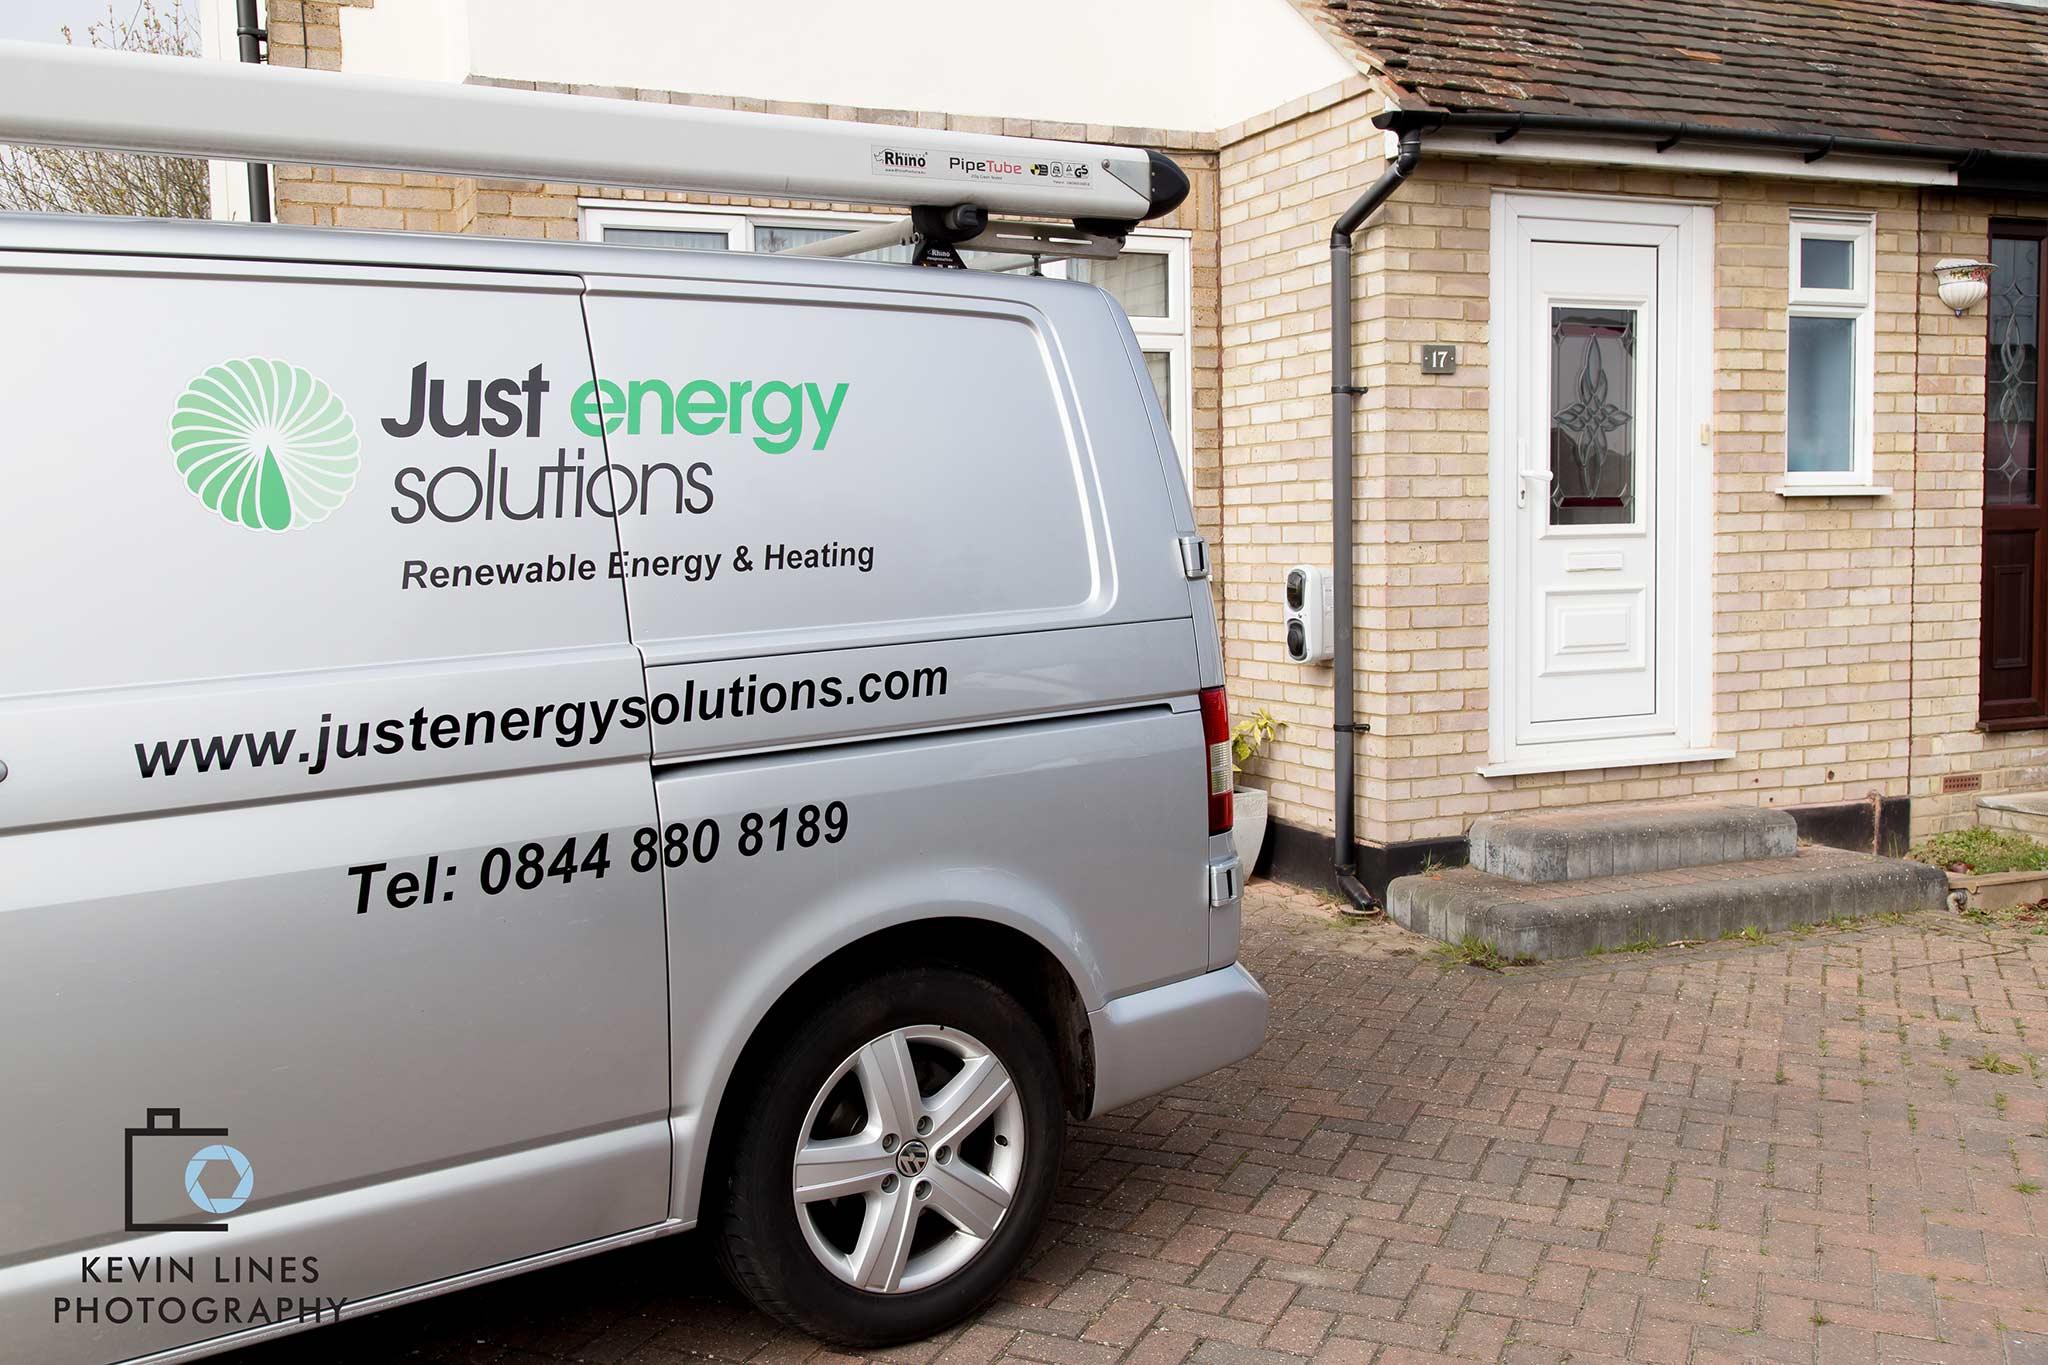 just-energy-solutions-60.jpg